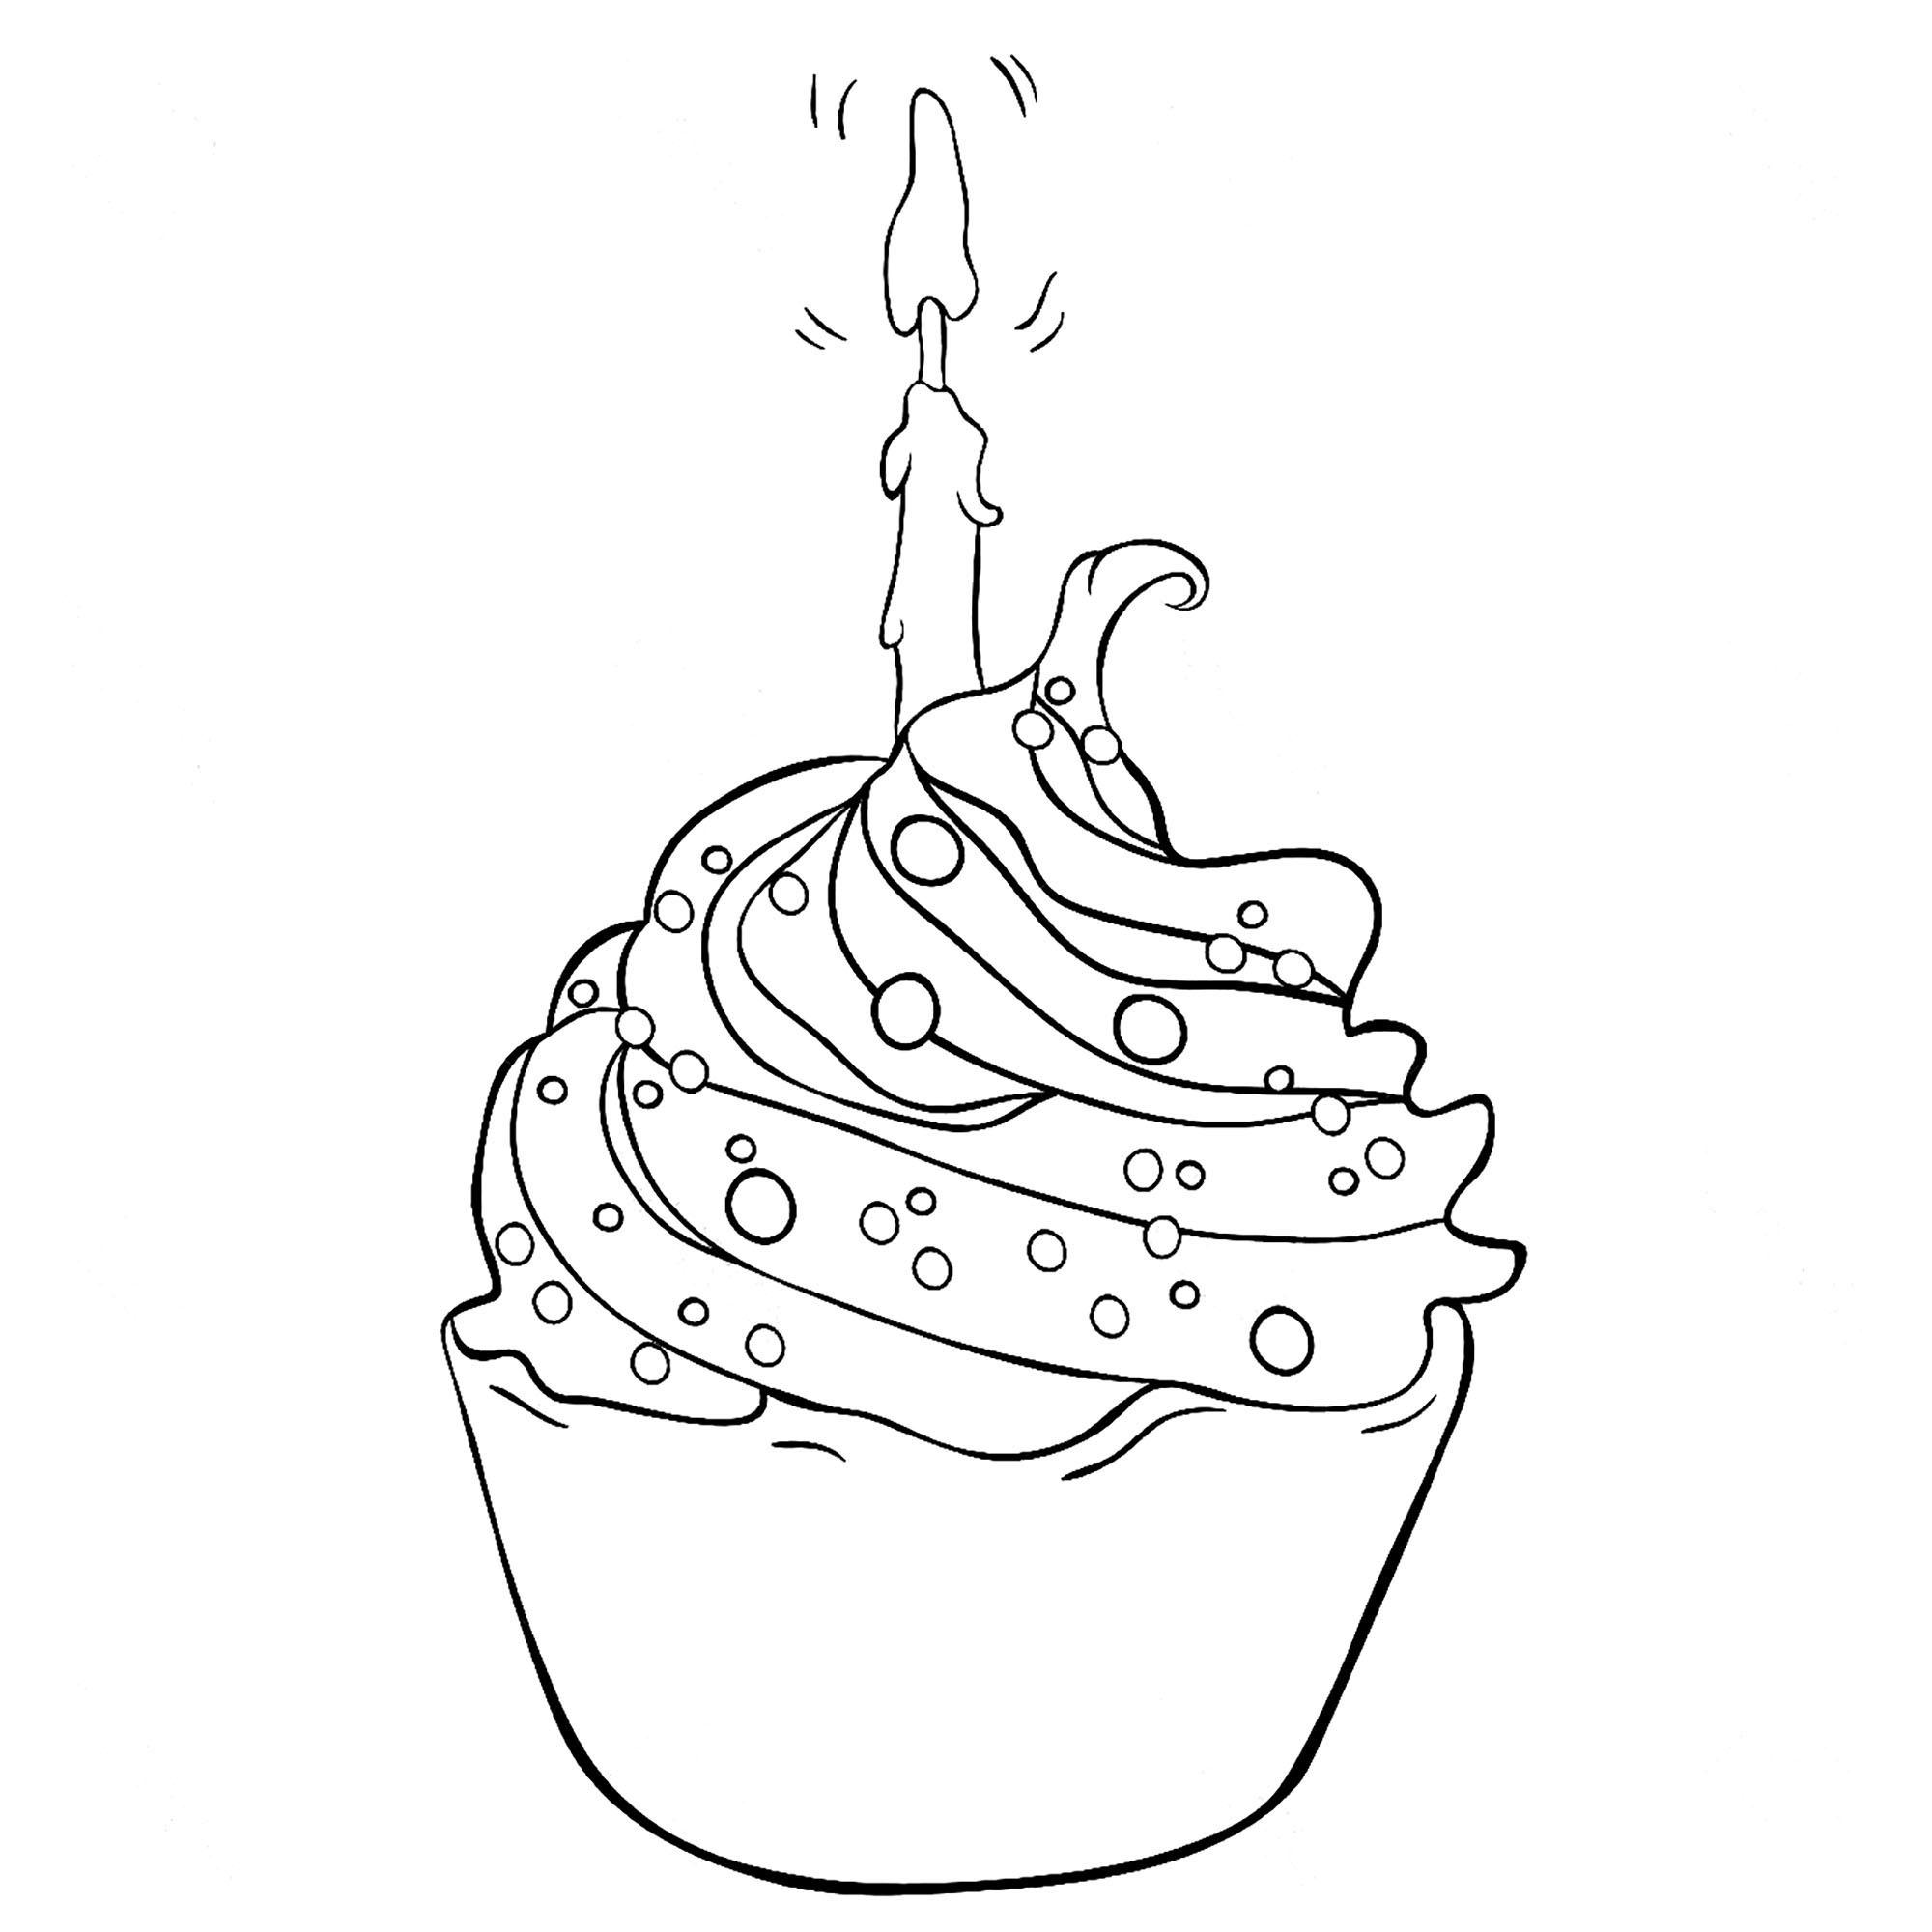 Dessin De Cupcake A Imprimer~Dessin De Cupcake À Imprimer dedans Coloriage De Cupcake